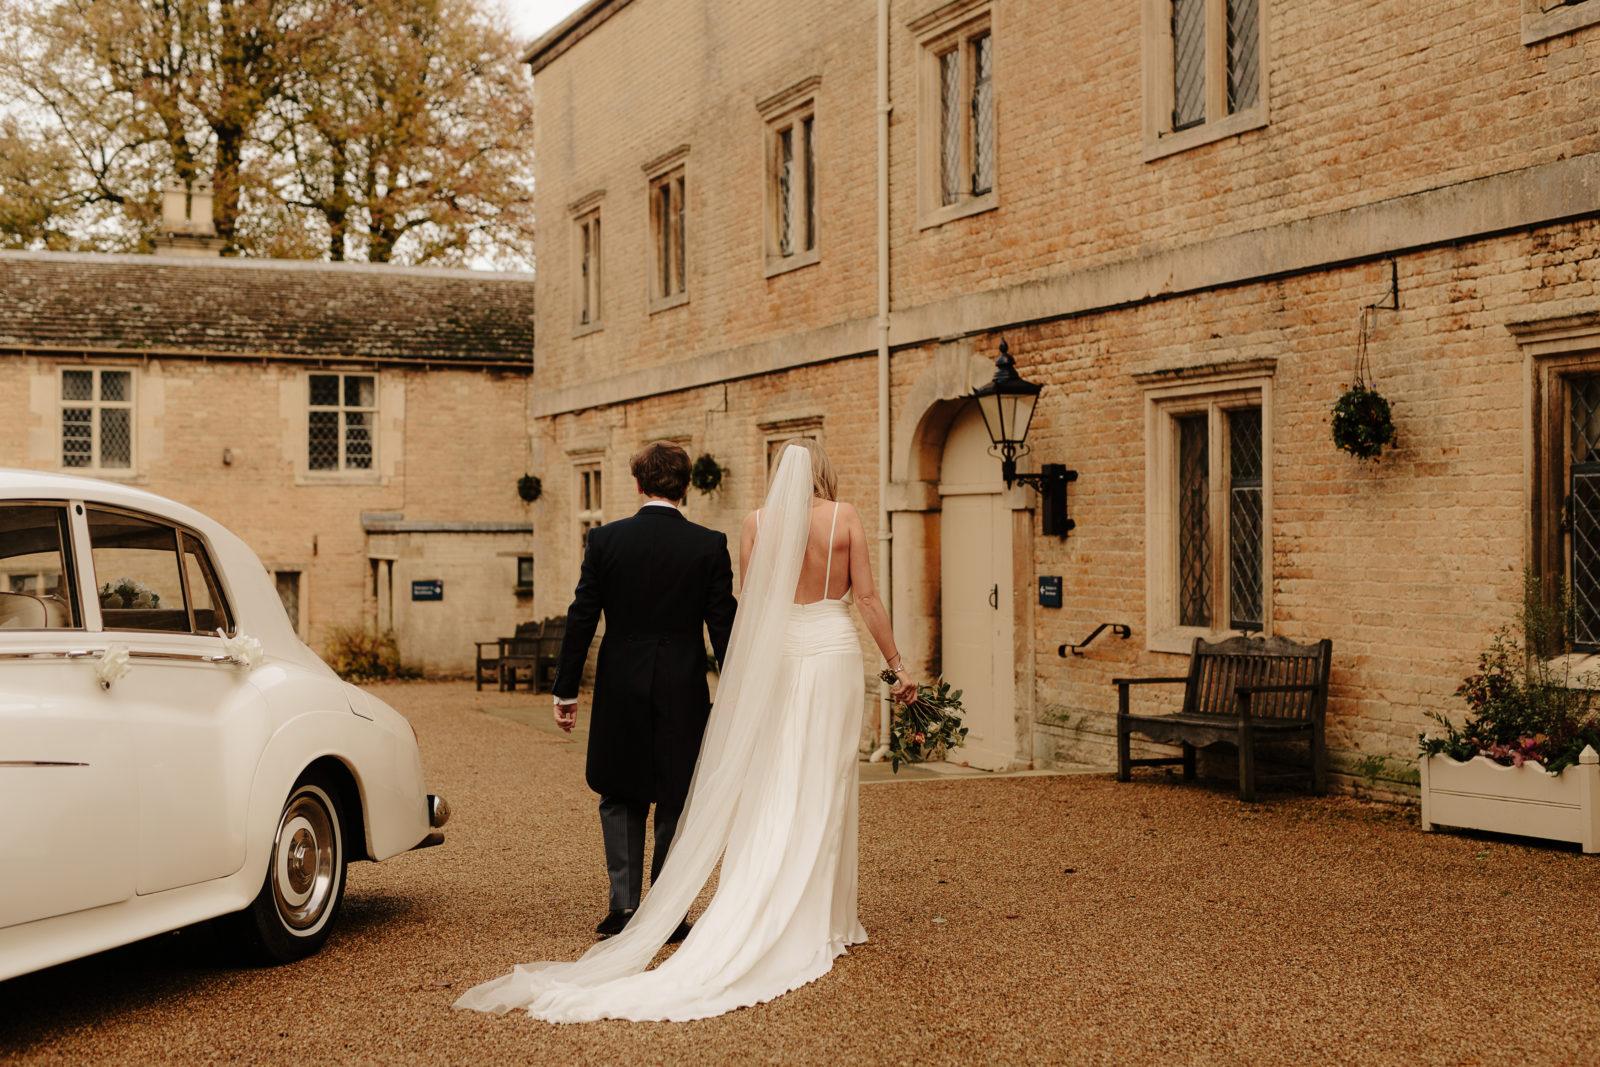 Wedding Dress - Delphine Manivet Hyppolite Wedding Dress